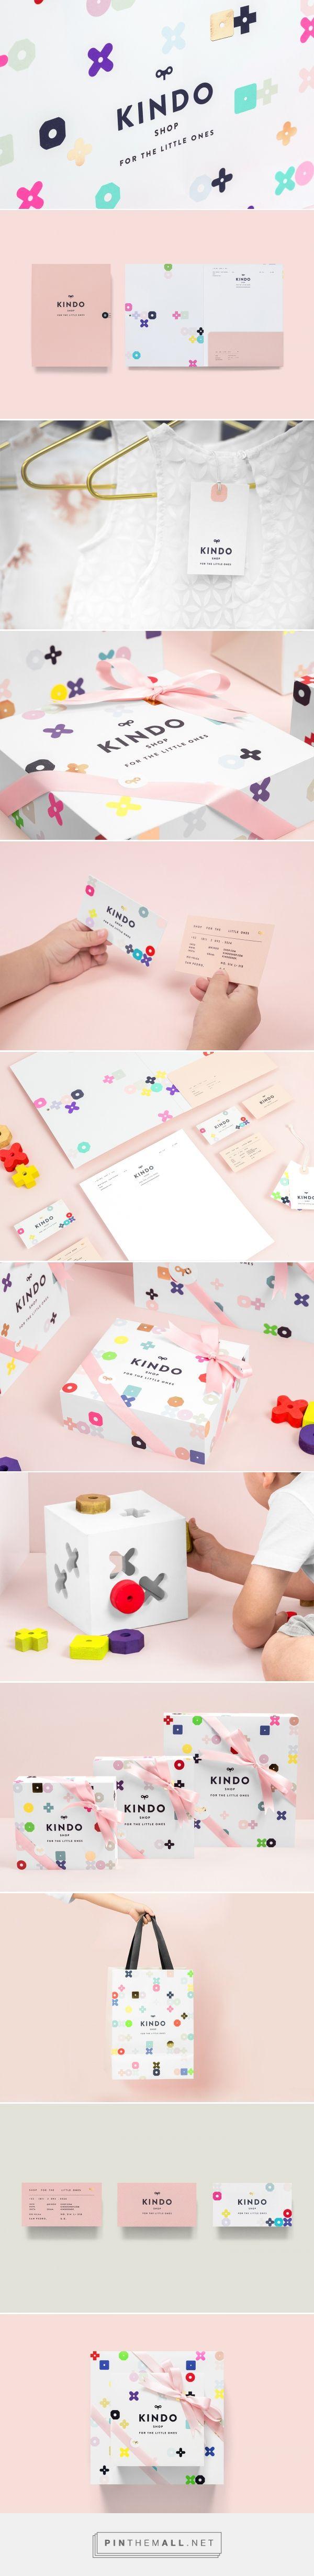 Kindo on Behance | Fivestar Branding – Design and Branding Agency & Inspiration Gallery